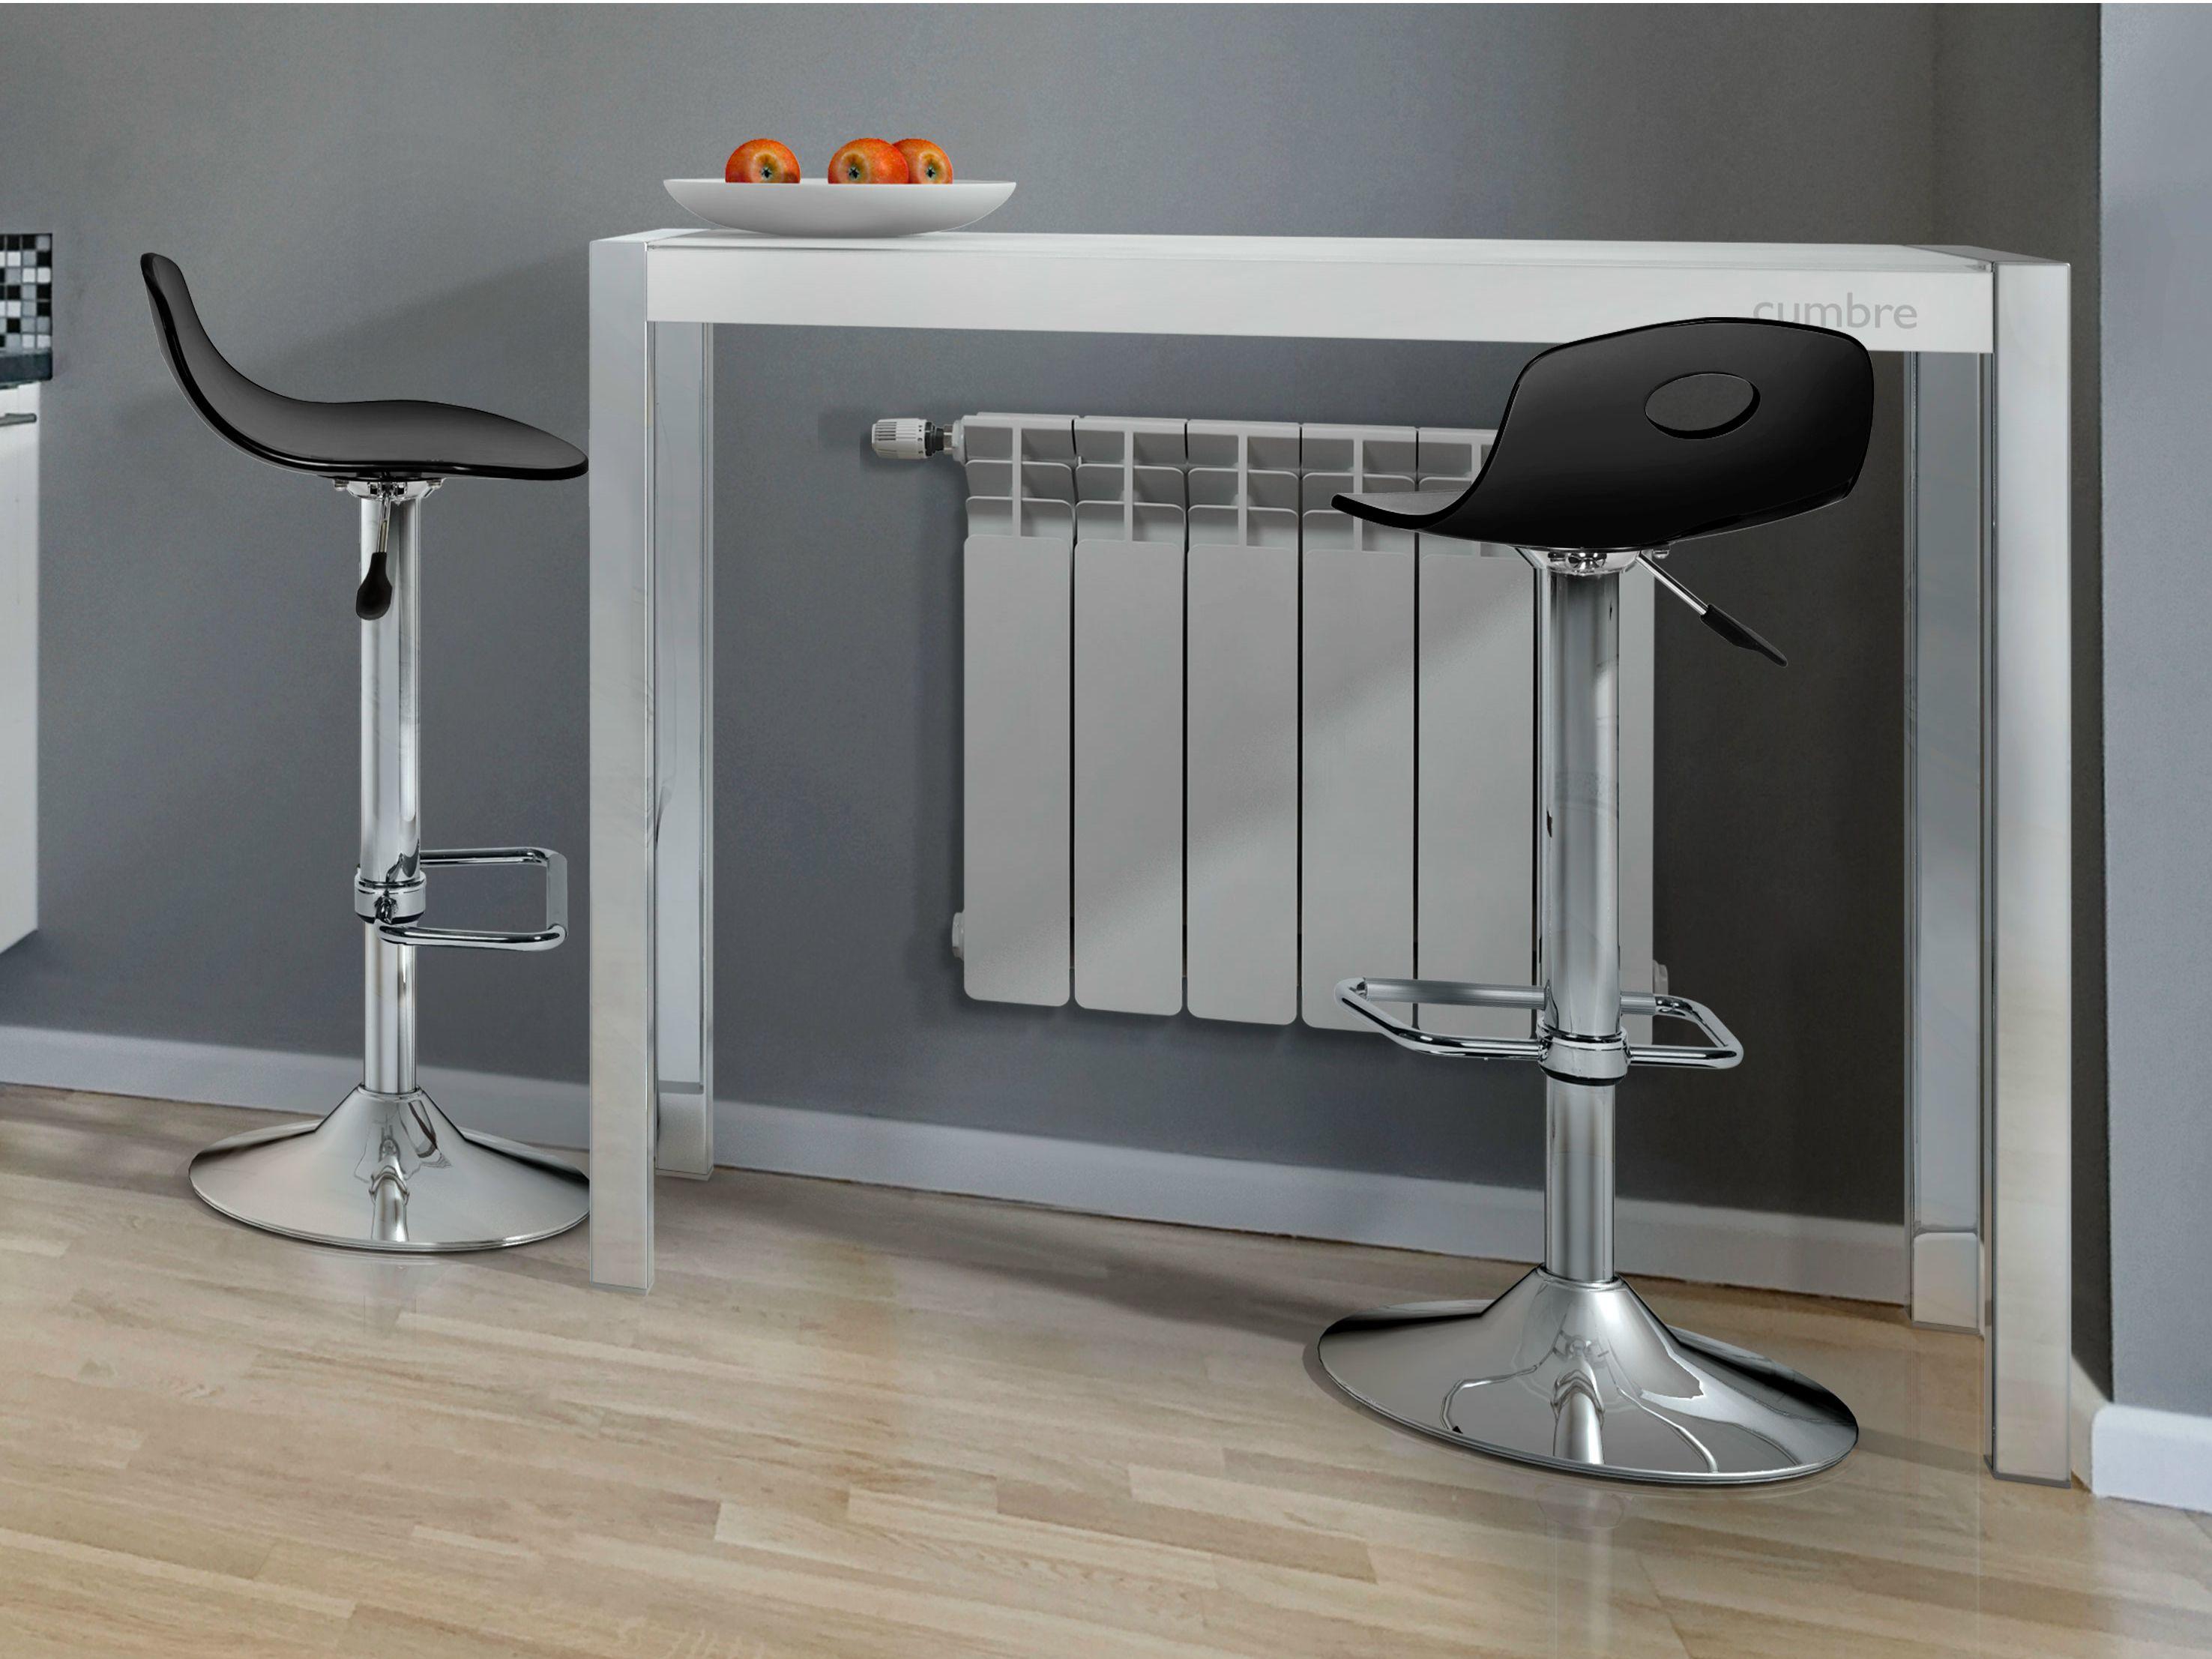 Tavolo alto cucina con sgabelli design casa creativa e for Tavolo alto ikea